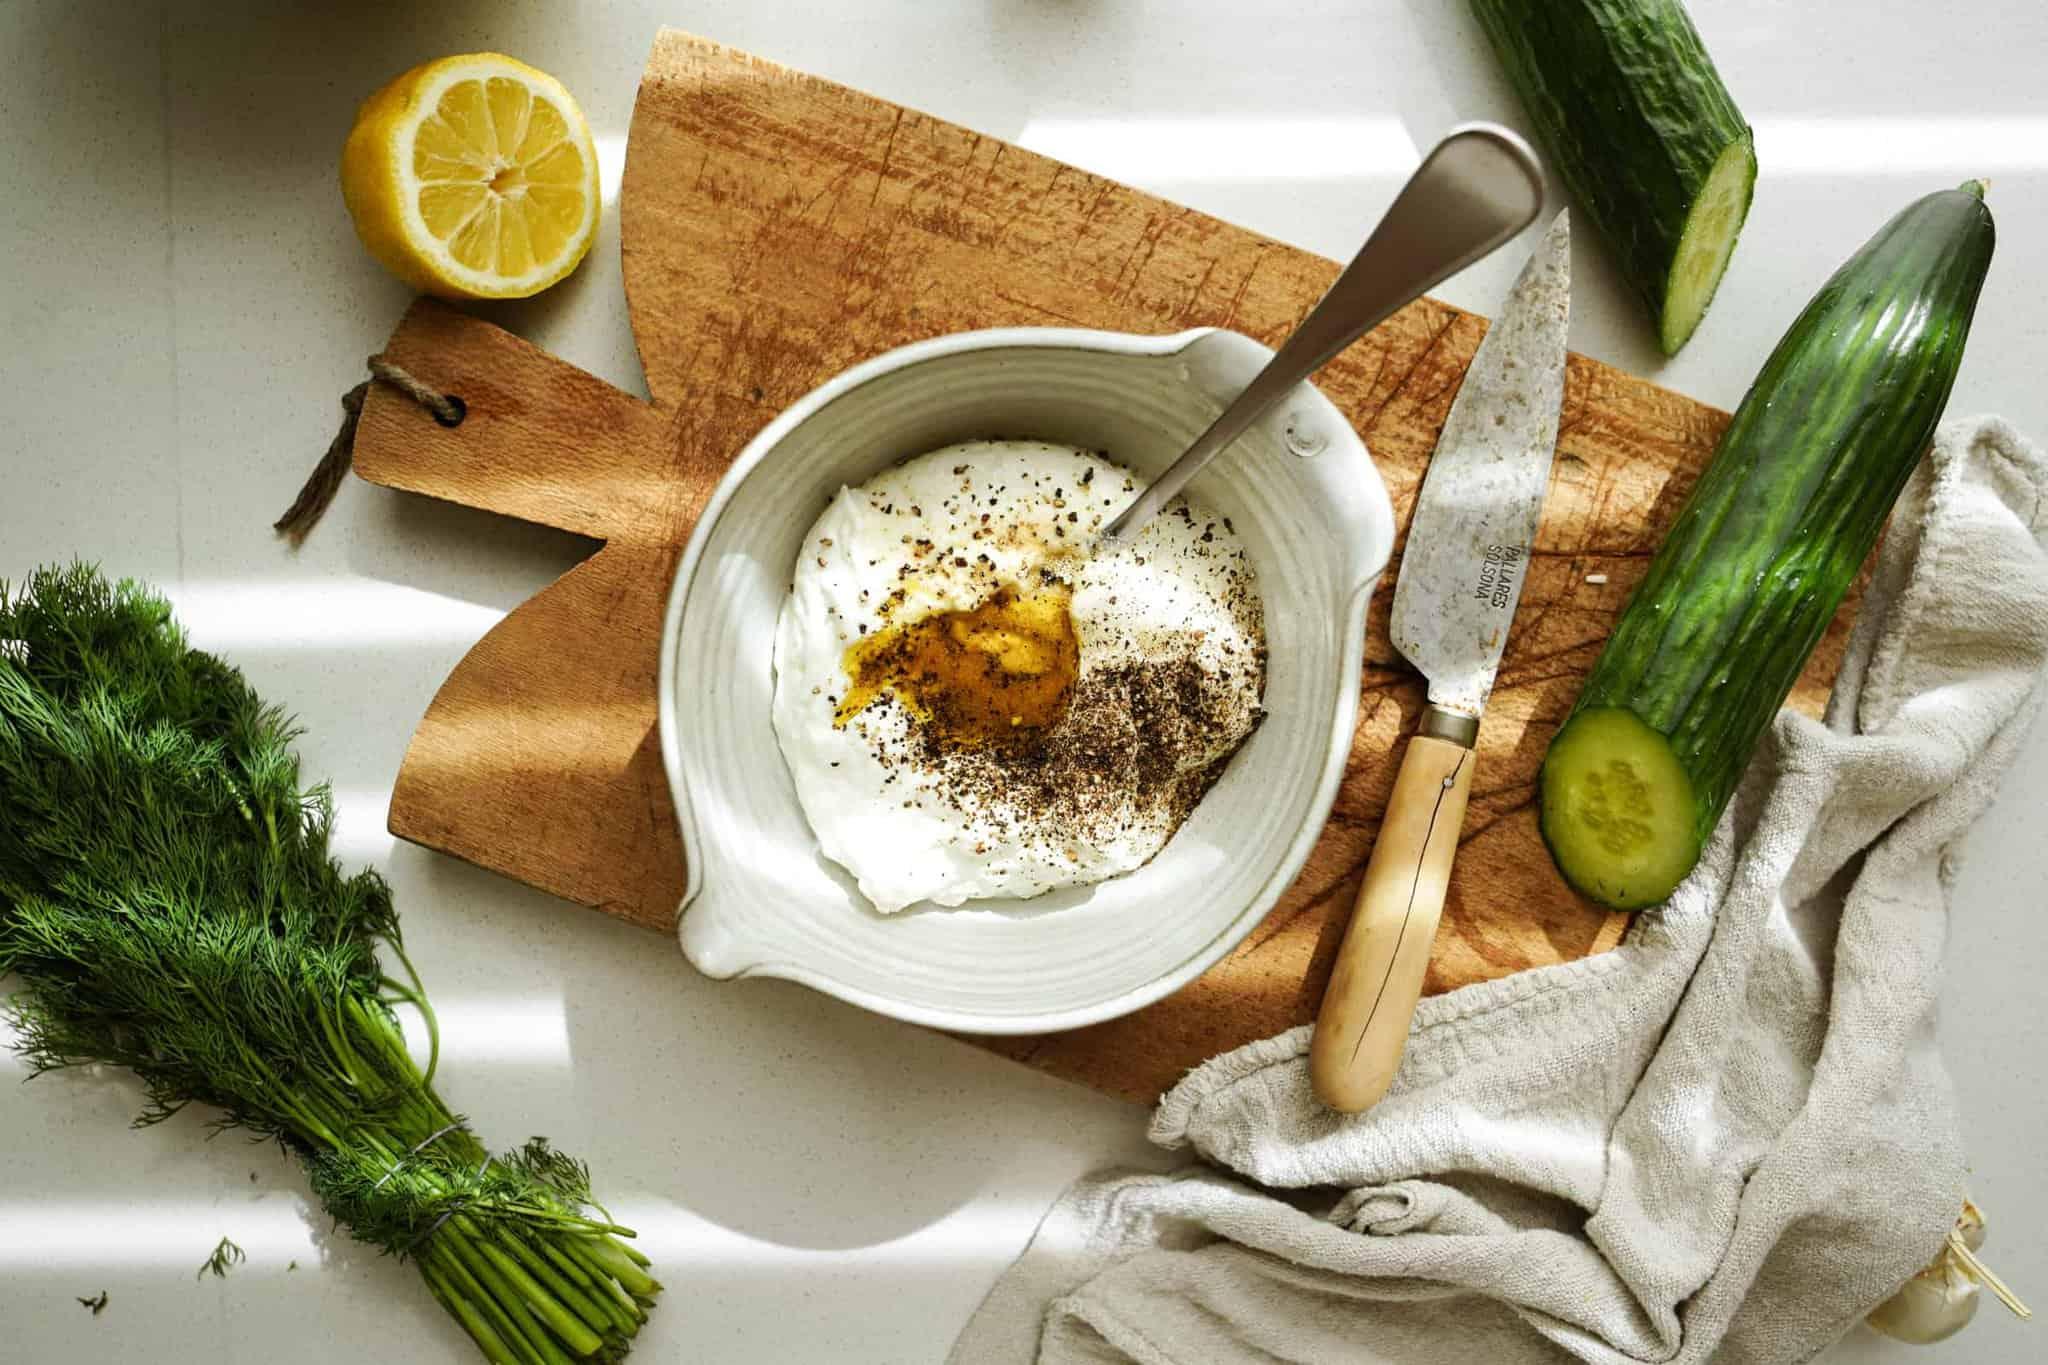 Ingredients for Greek Tzatziki Sauce in a bowl